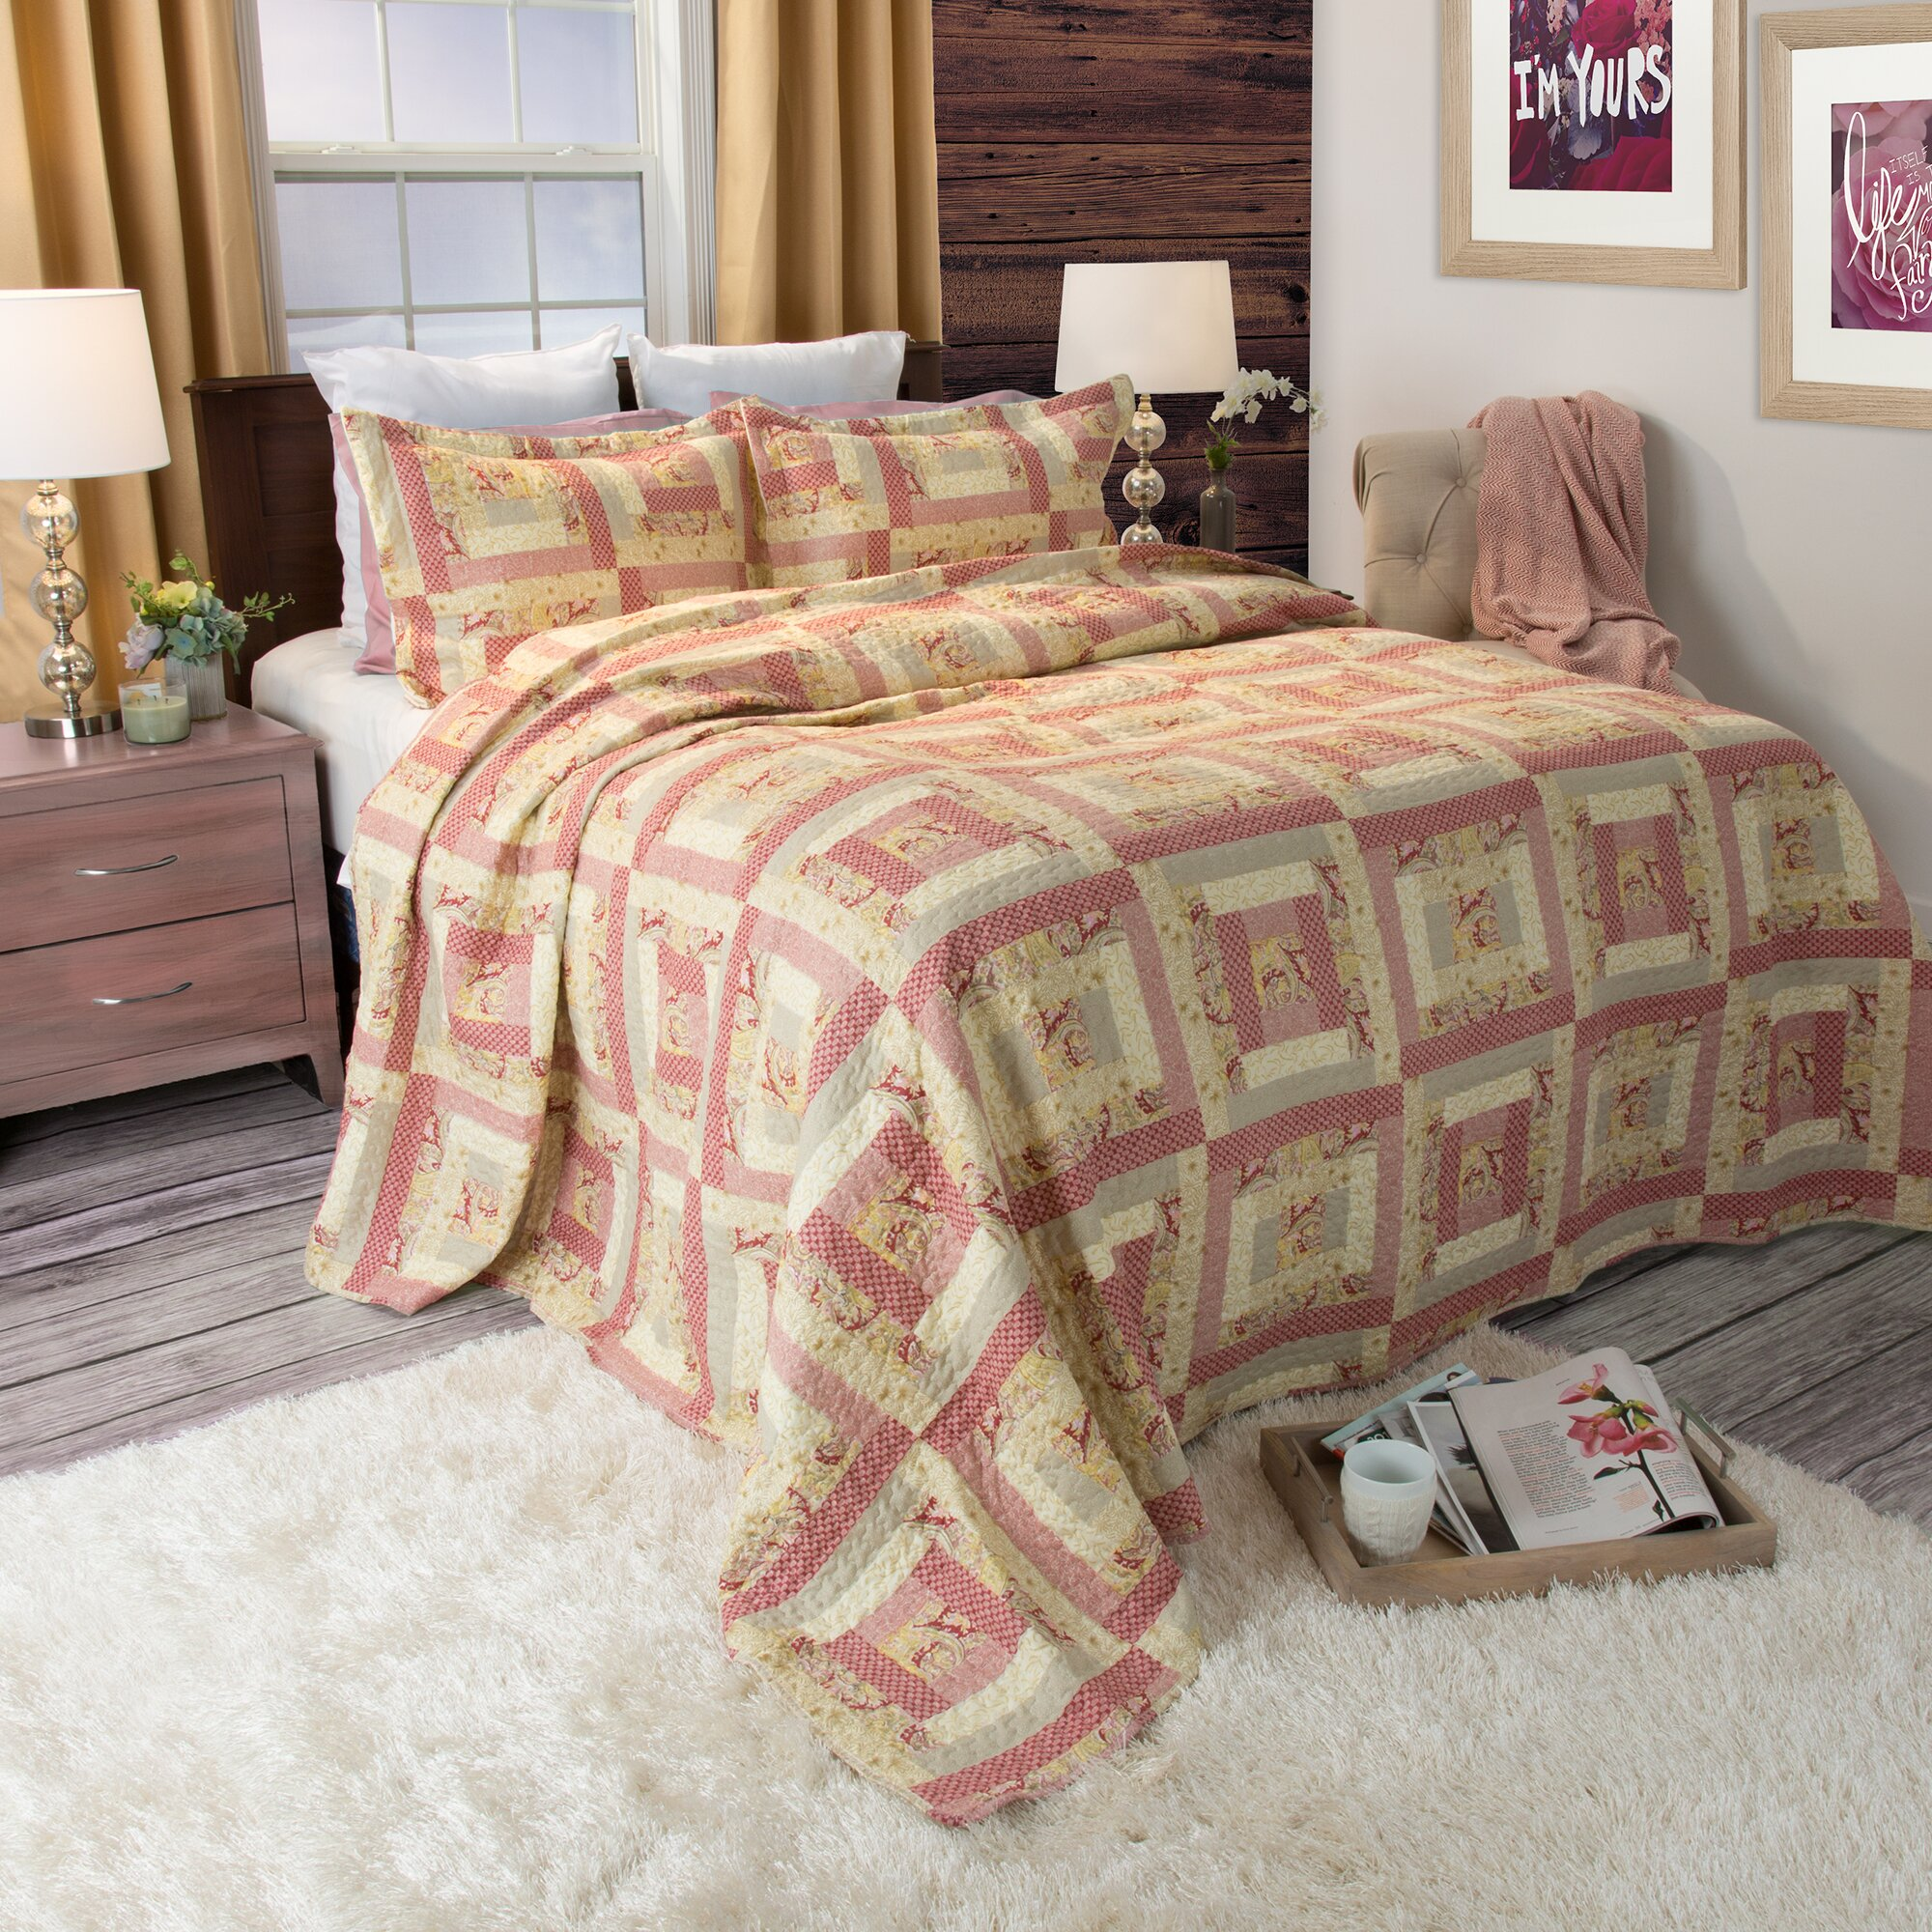 Bed sheet set with quilt - Melissa Quilt Set